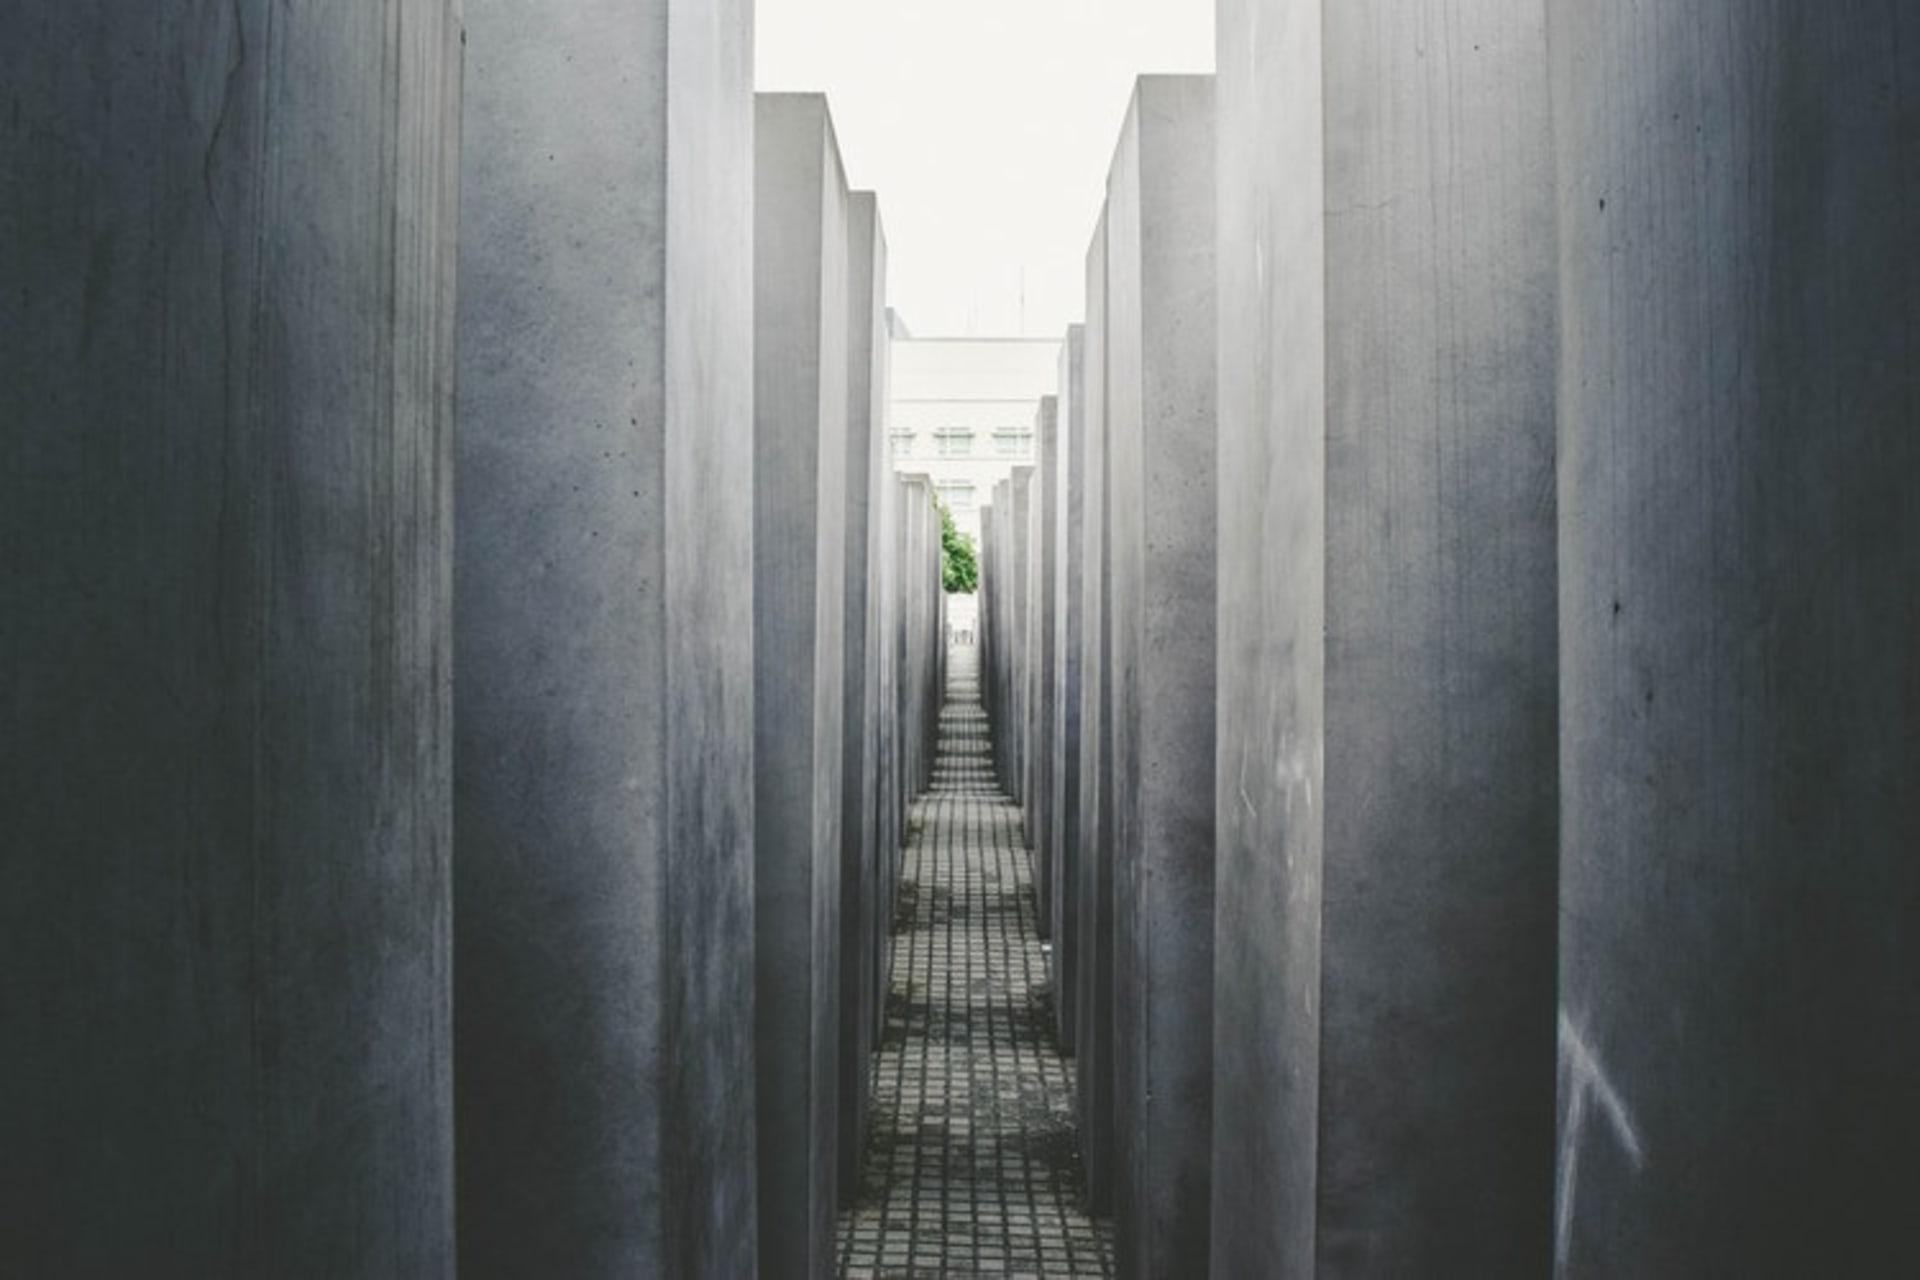 Berlin - The German Resistance Between 1933 - 1945: An Introduction